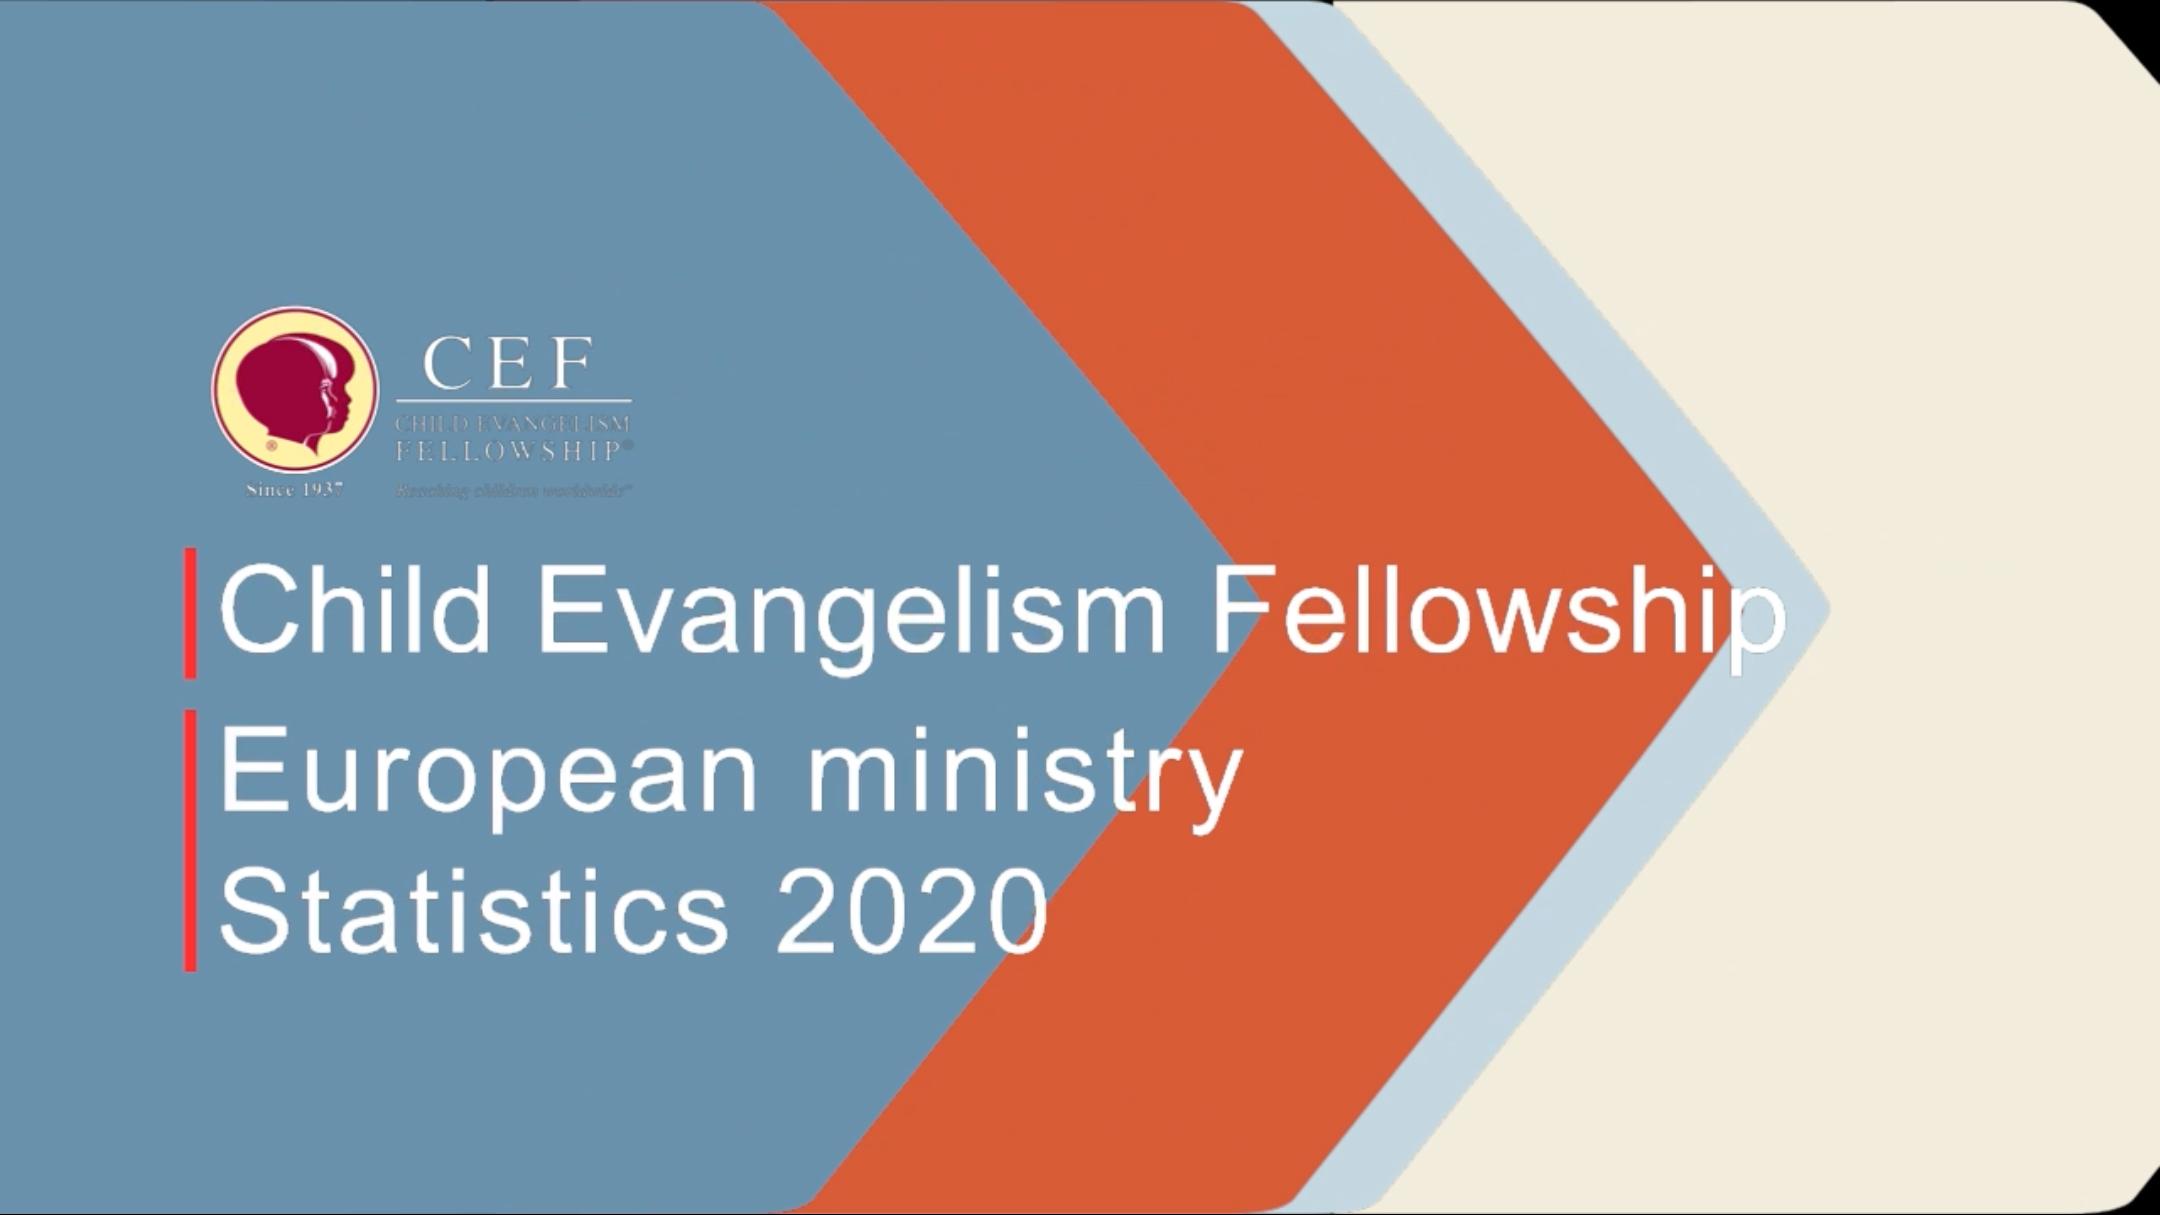 European ministry statistics 2020